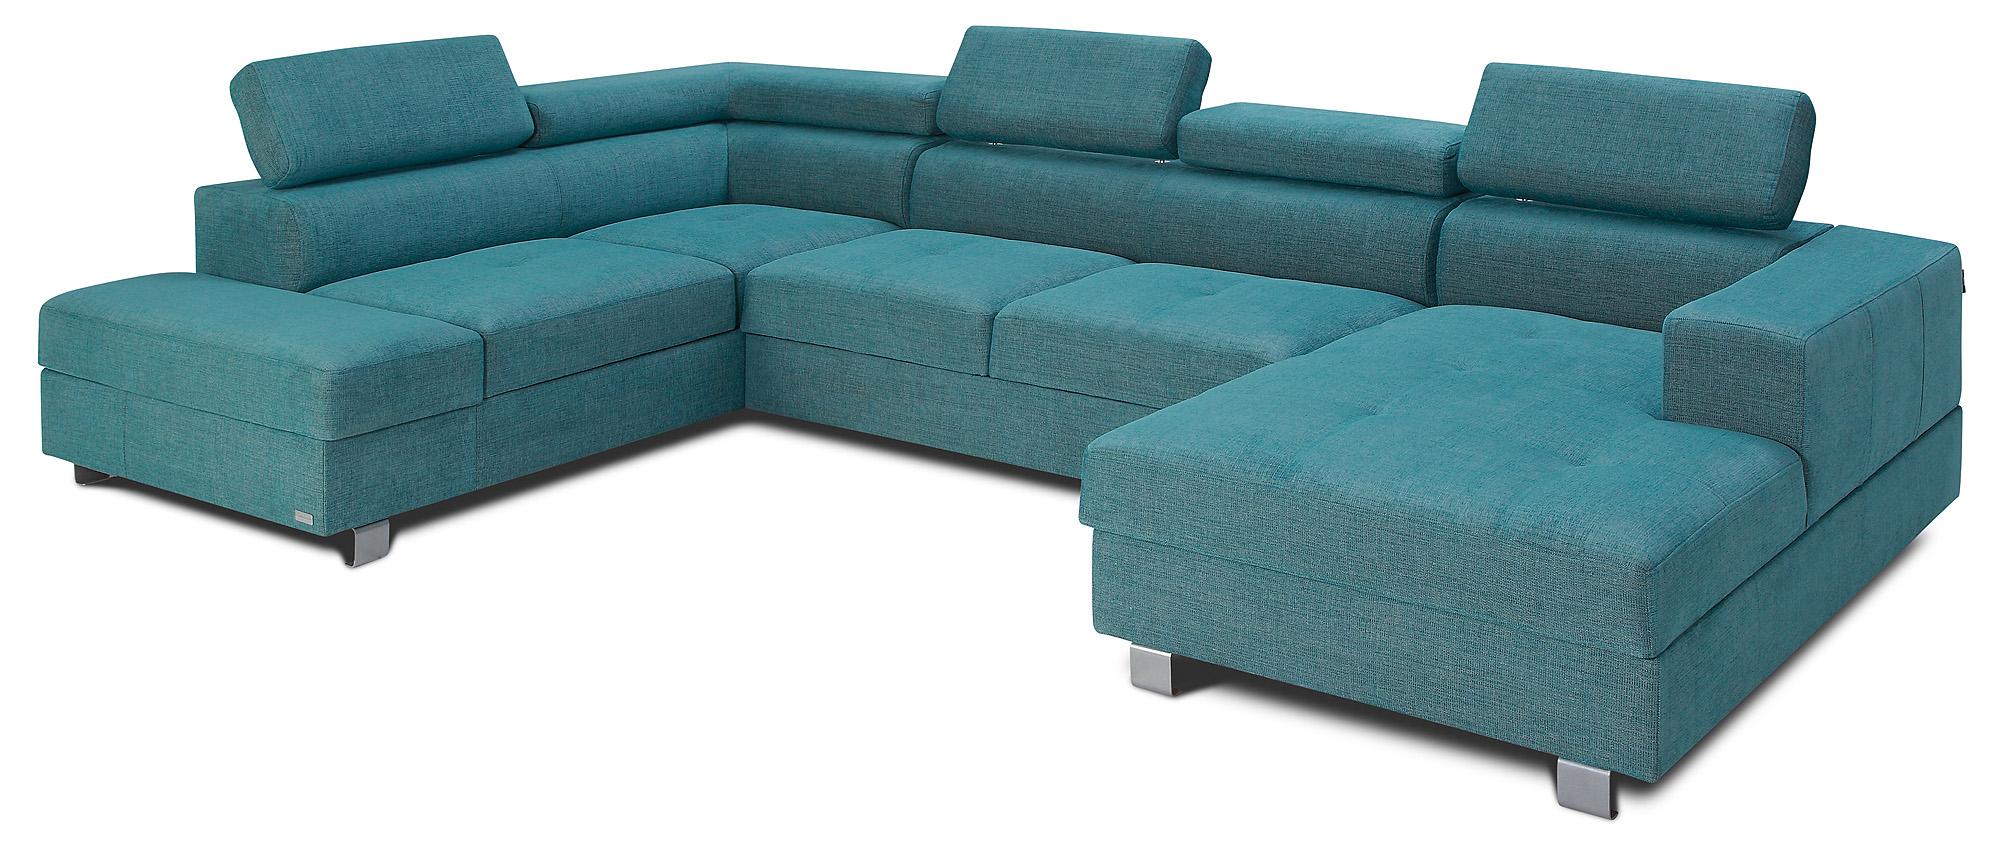 enzo modulio caya design studio komfort warszawa 2